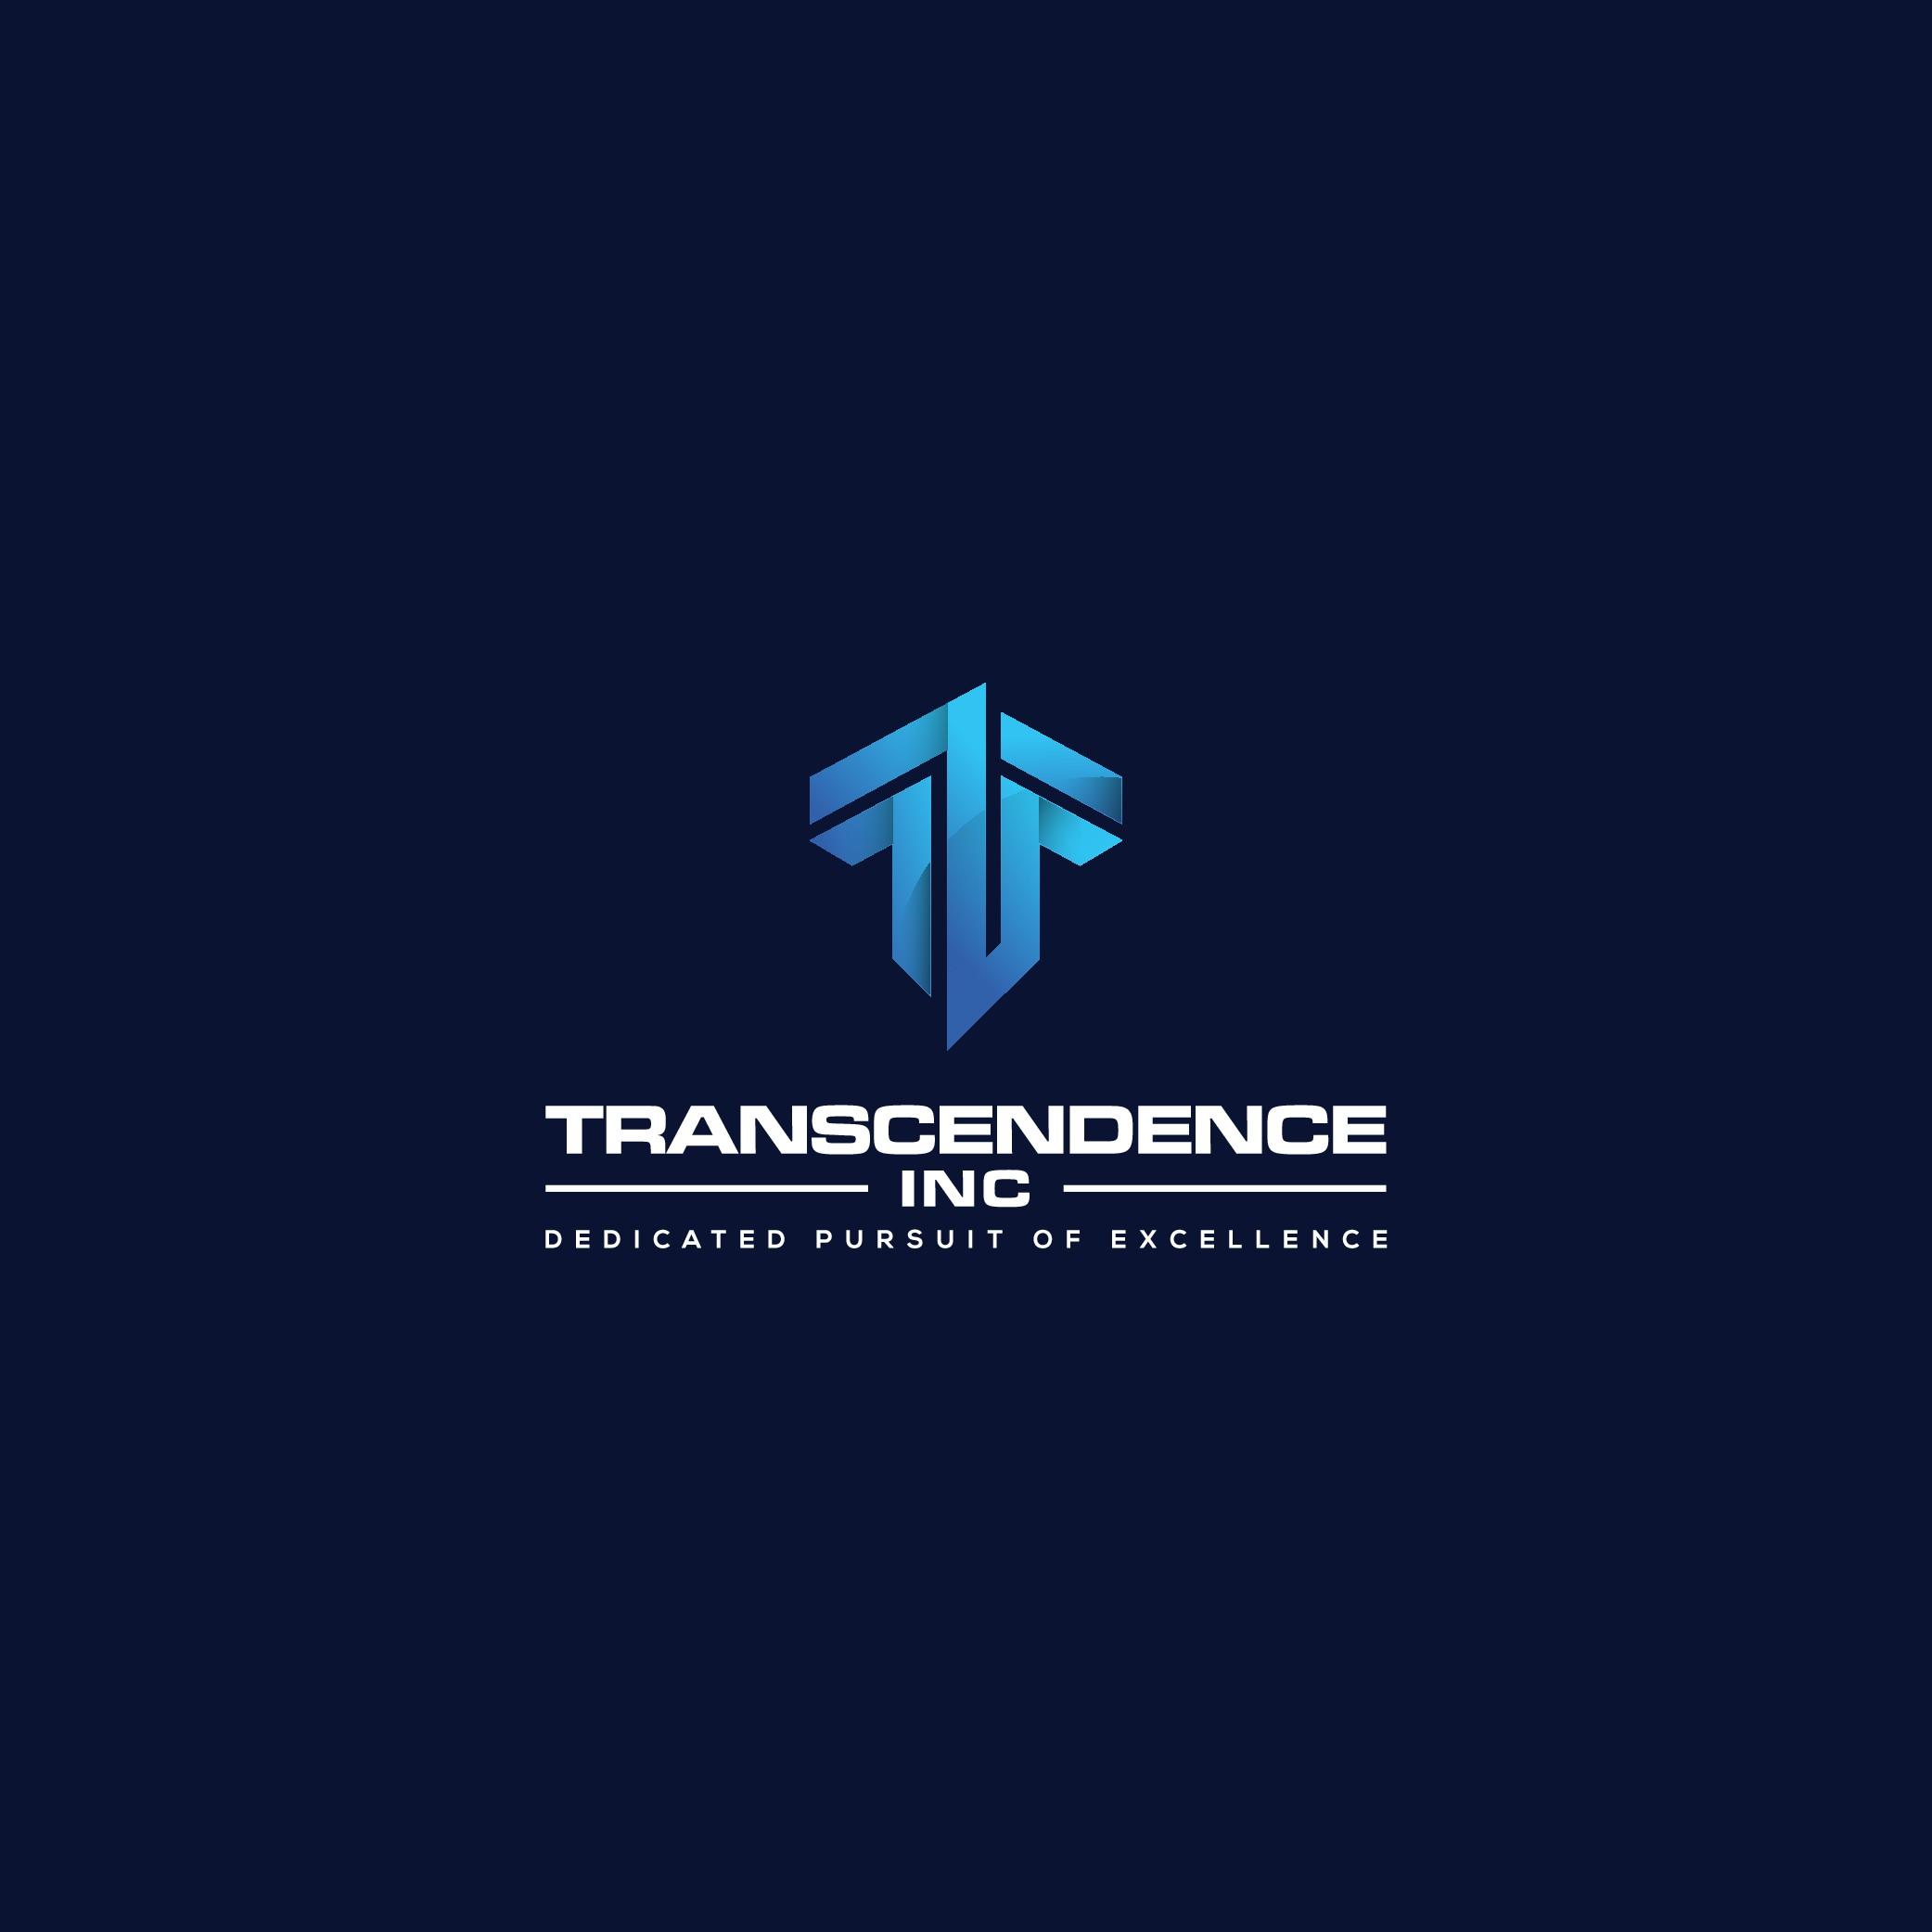 Design a brand logo for Transcendence Inc - A trucking service brand